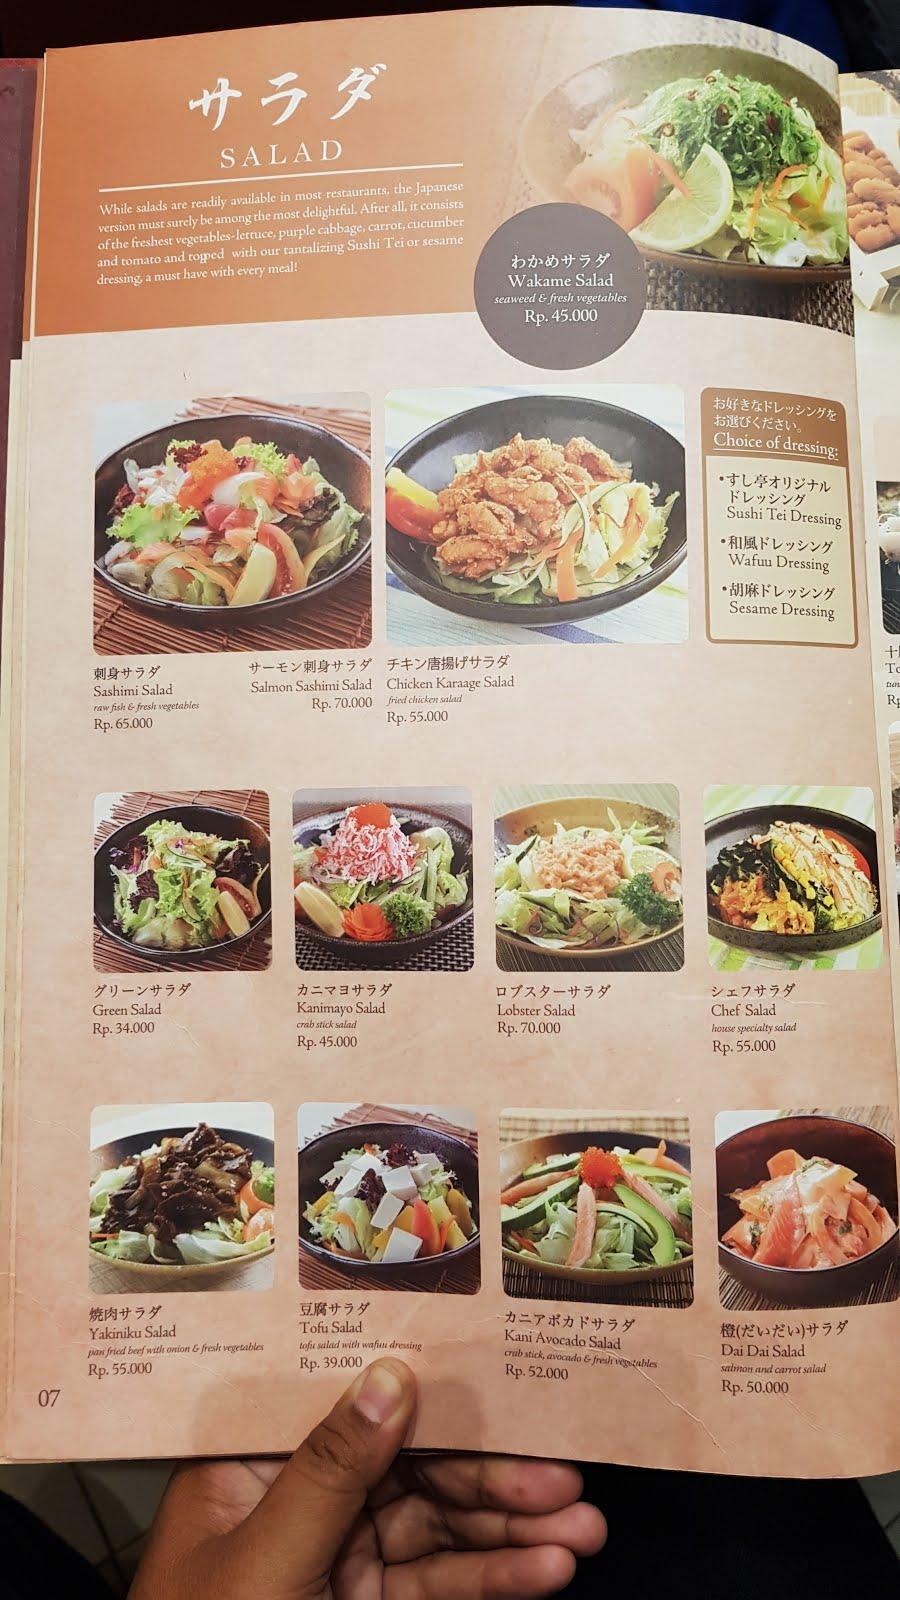 Sushi Tei Rp 0